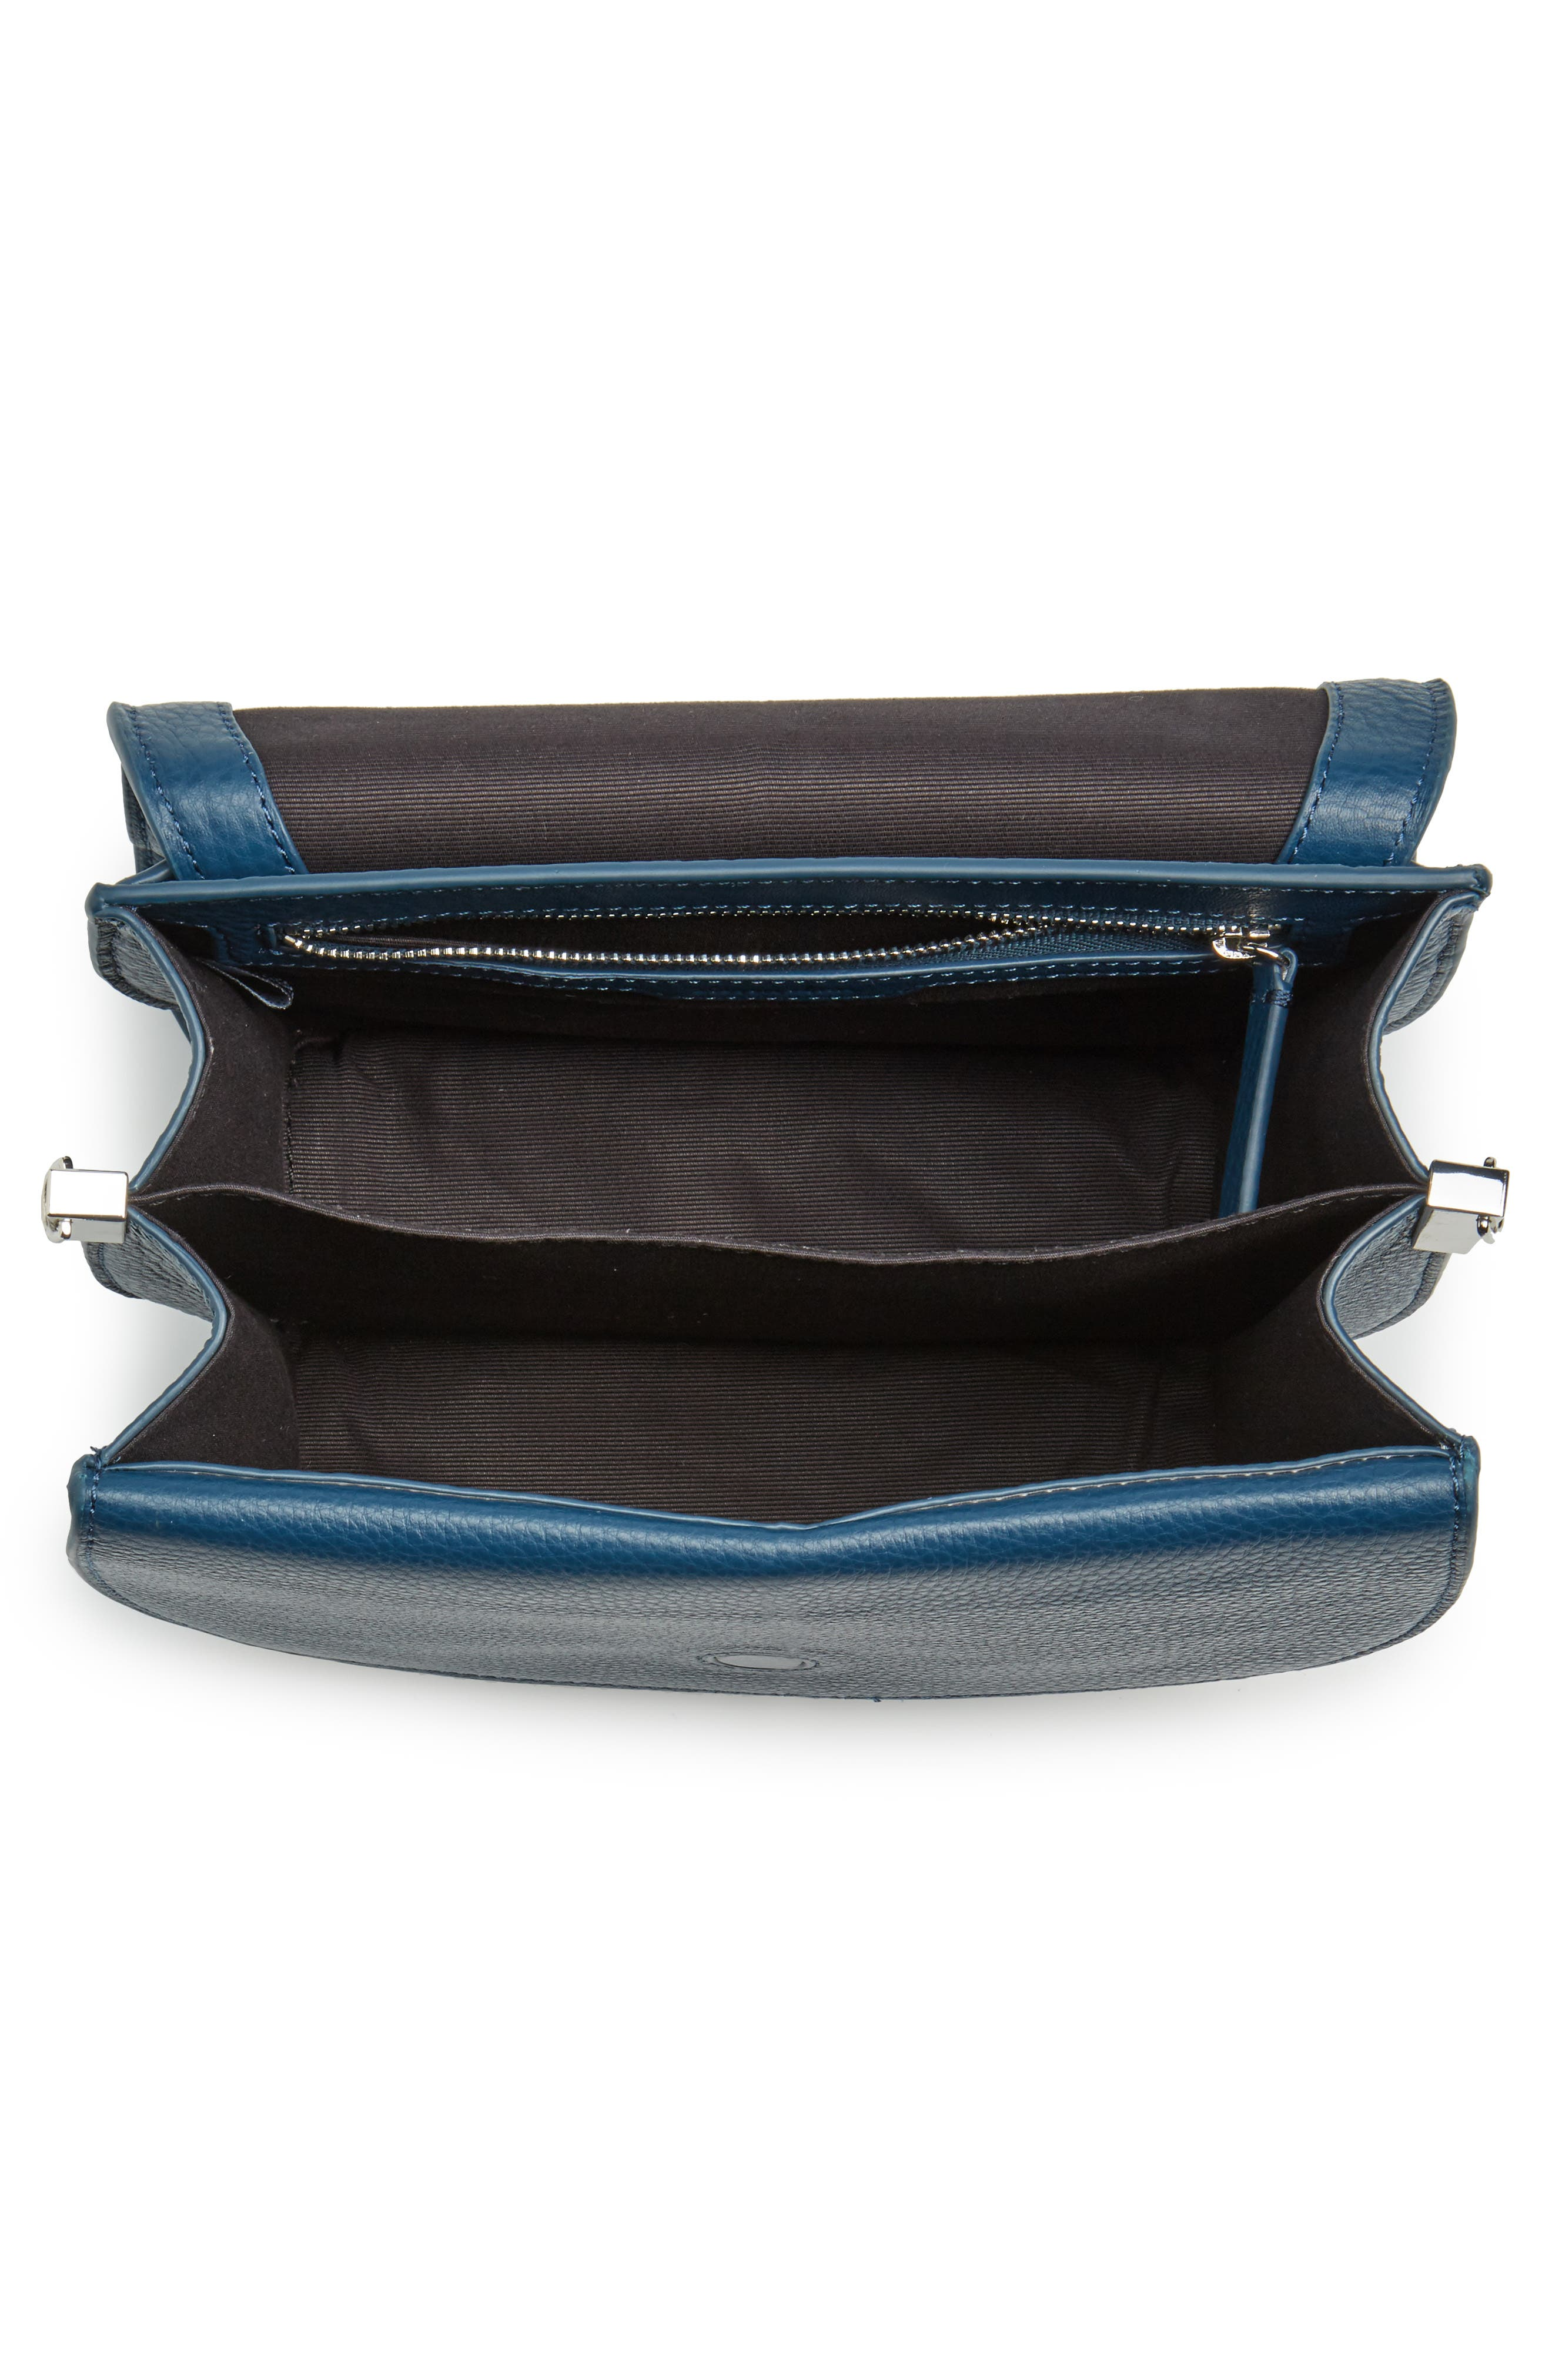 Landon Leather Crossbody Saddle Bag,                             Alternate thumbnail 14, color,